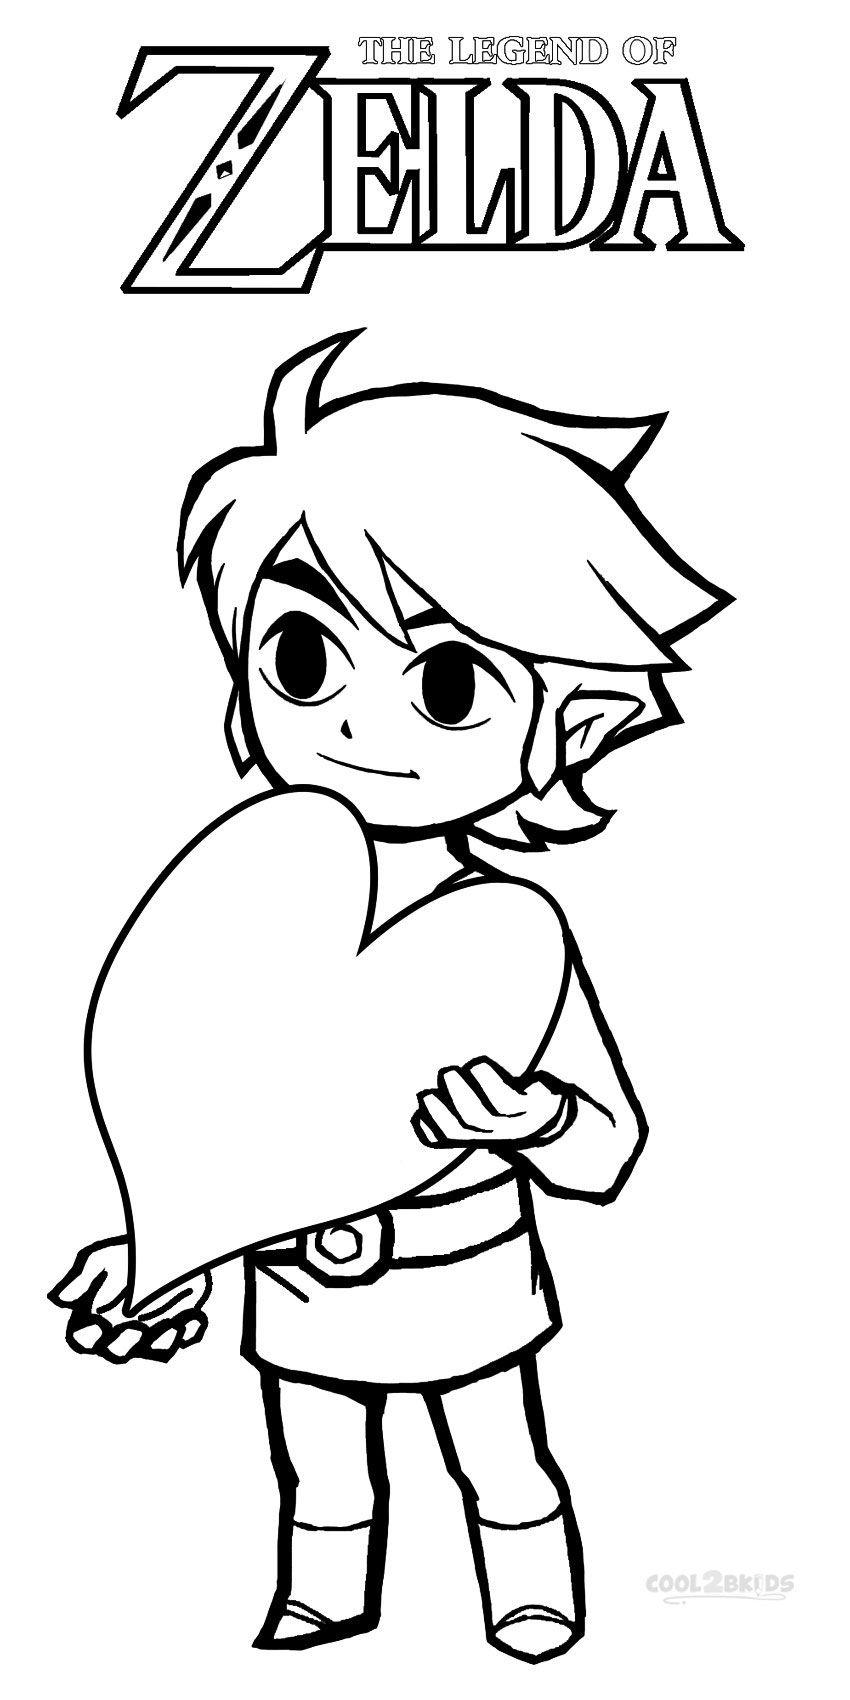 Printable Zelda Coloring Pages For Kids | Cool2bKids | Line art ...